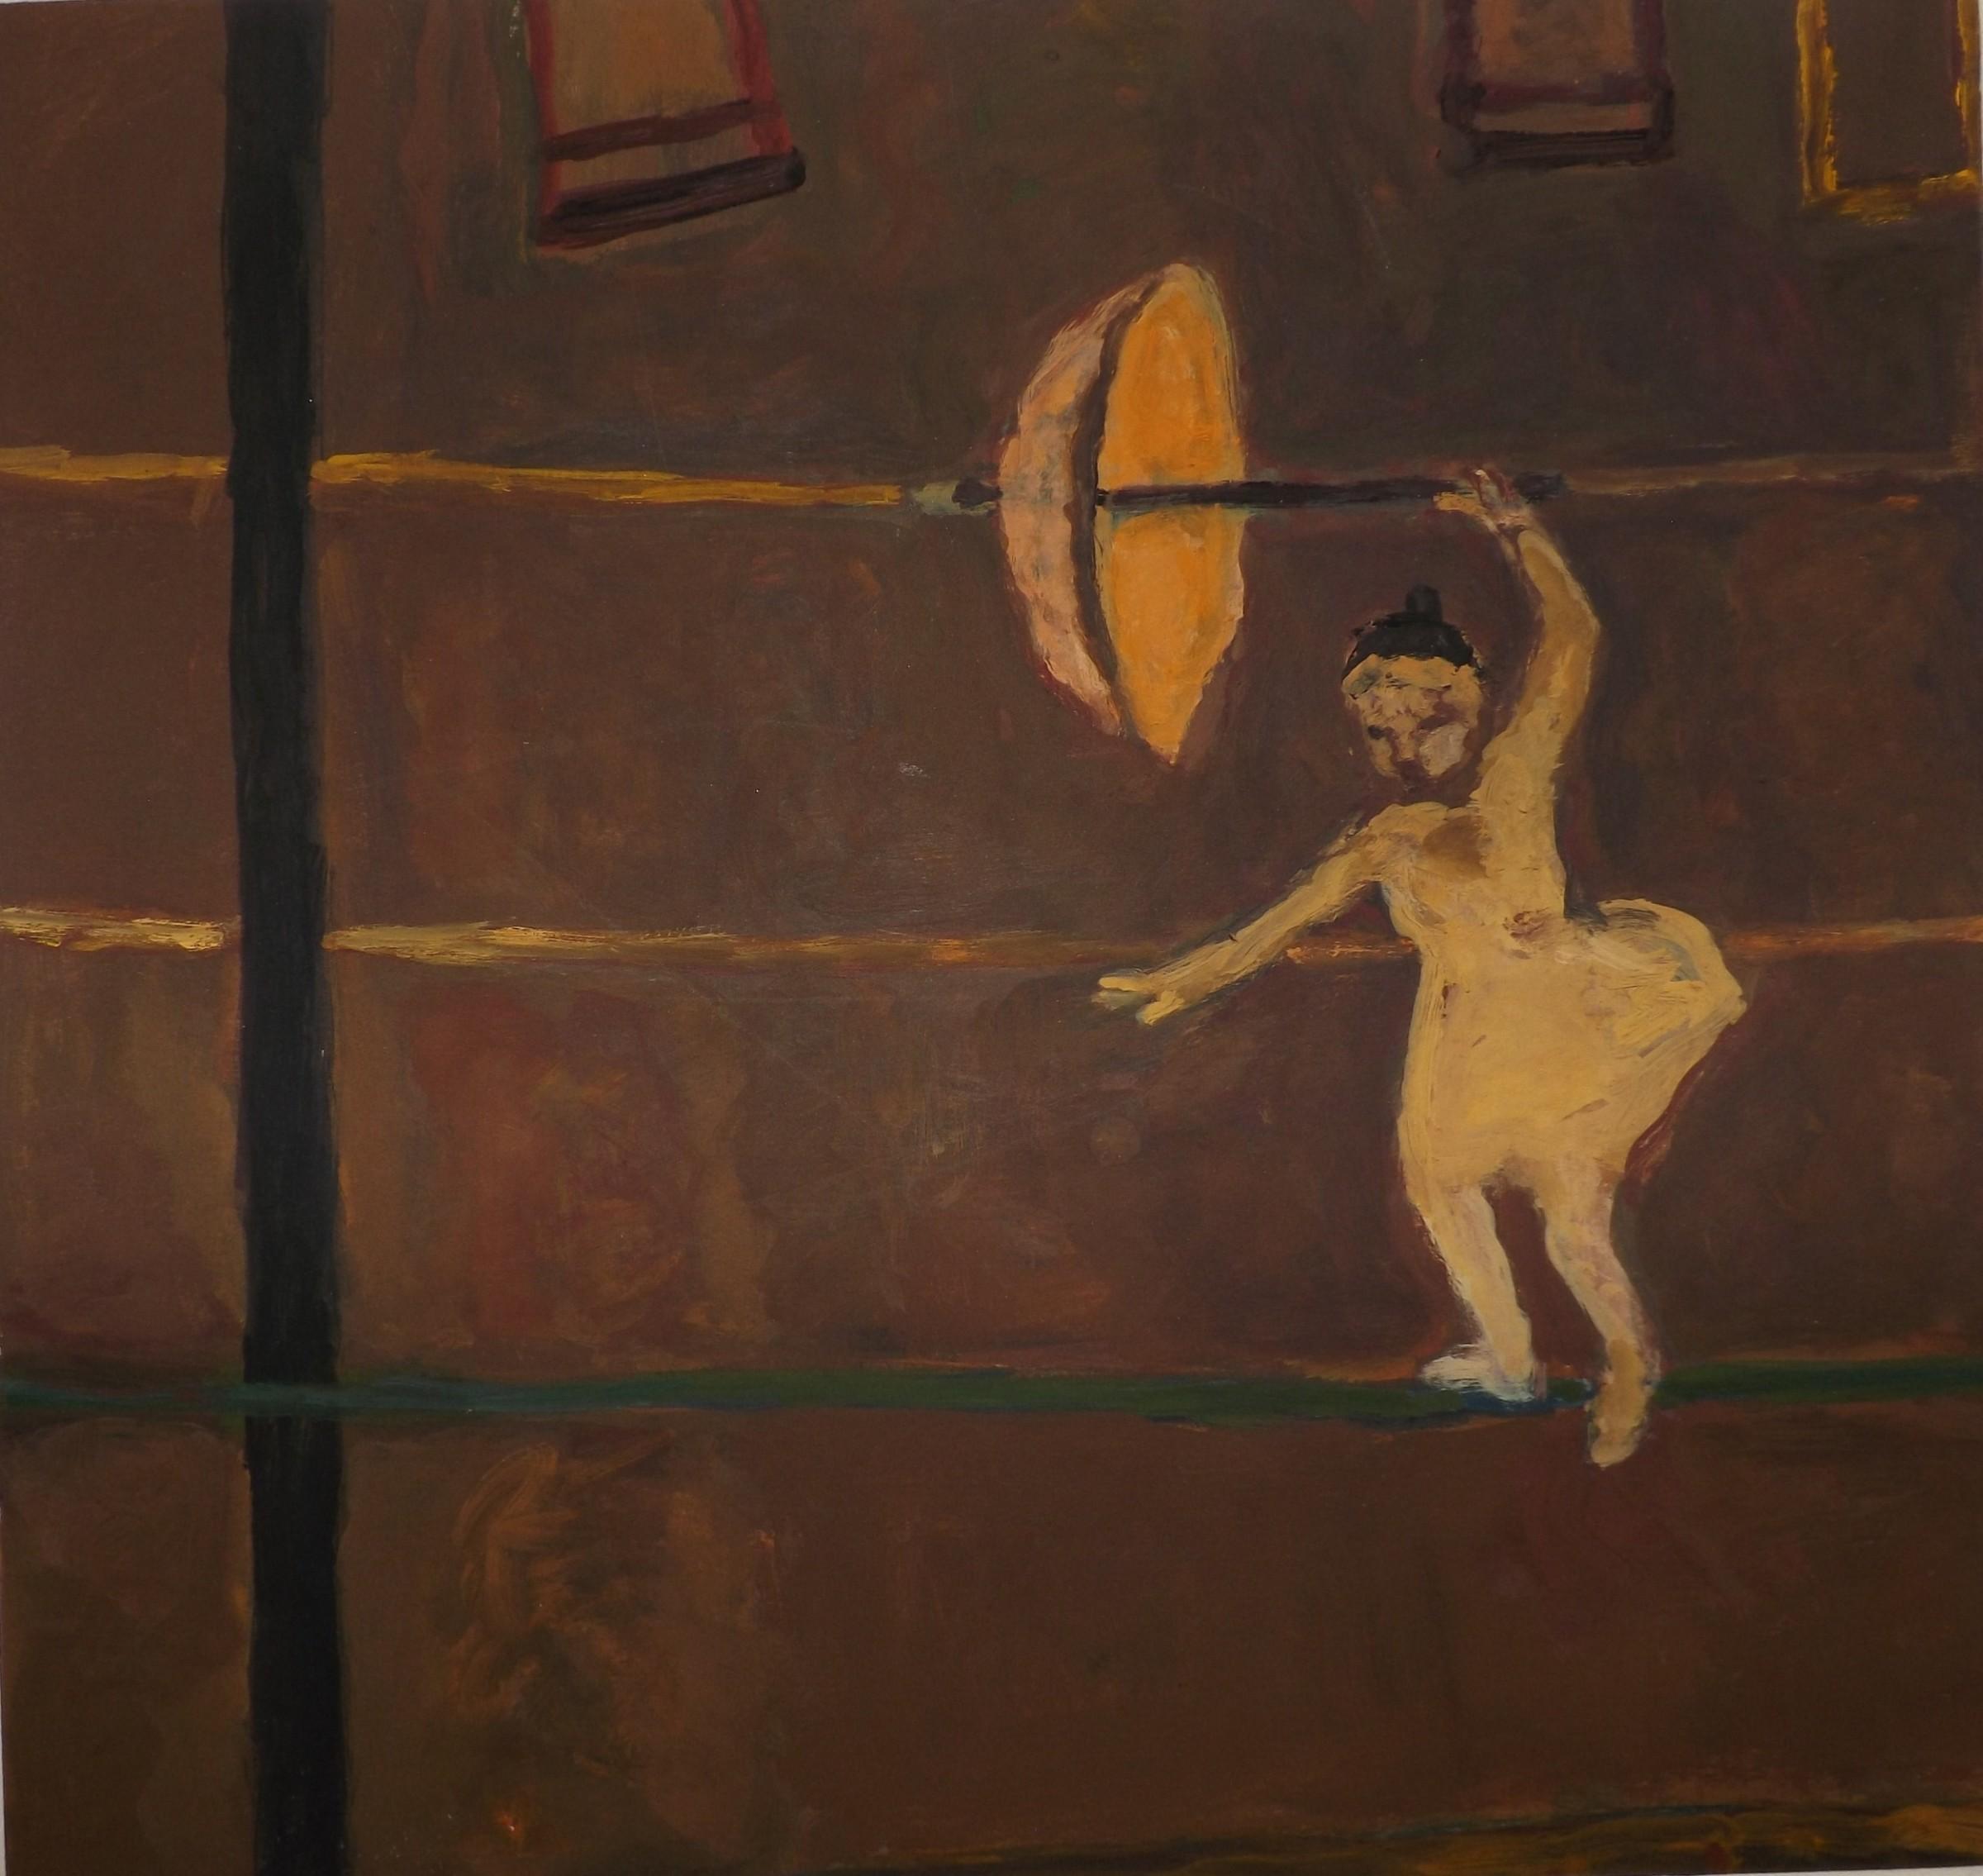 <span class=&#34;link fancybox-details-link&#34;><a href=&#34;/exhibitions/24/works/artworks_standalone10754/&#34;>View Detail Page</a></span><div class=&#34;artist&#34;><span class=&#34;artist&#34;><strong>Bridget Moore</strong></span></div><div class=&#34;title&#34;><em>Girl on the Wire</em></div><div class=&#34;medium&#34;>gouache</div><div class=&#34;dimensions&#34;>43x42cm</div>